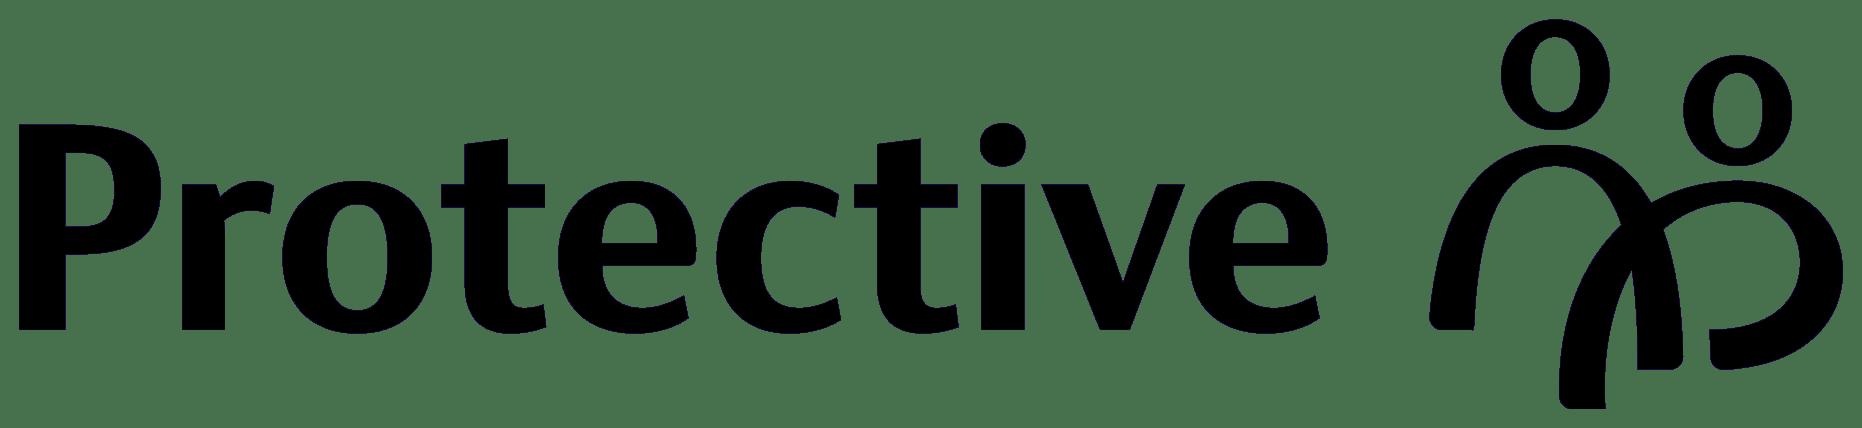 Protective Life New Logo